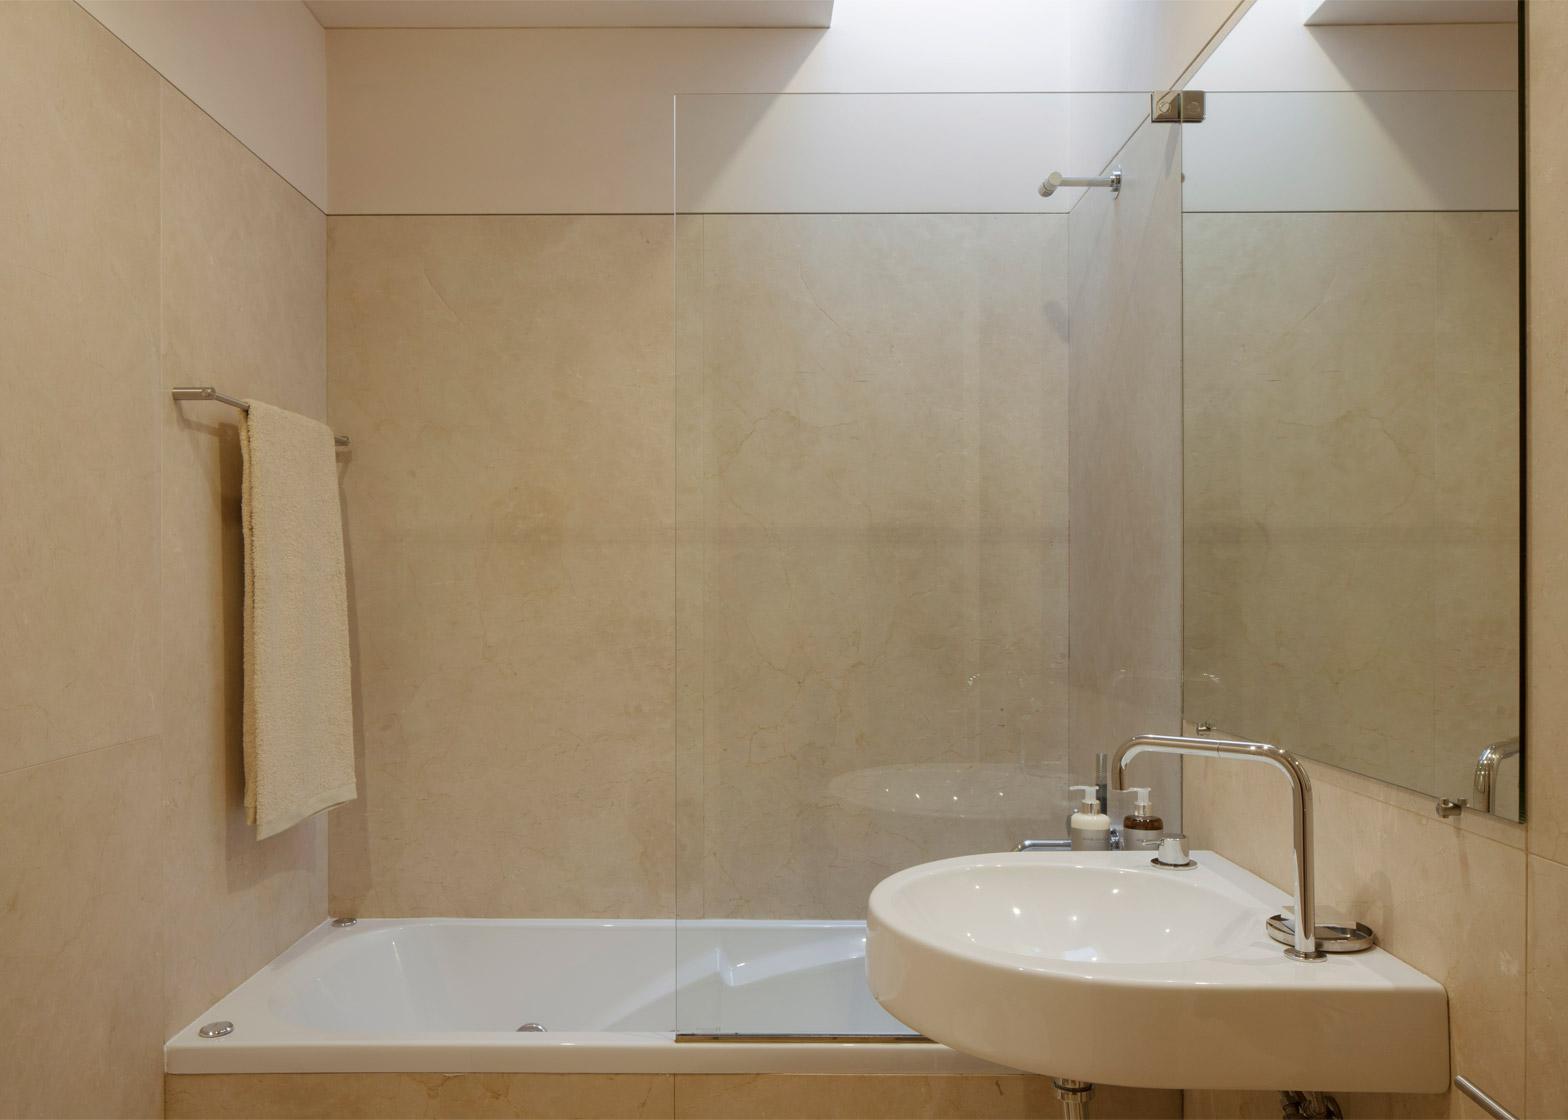 Architecture-courtyard-design-studia-interiors-osnovadesign-osnova-poltava-14